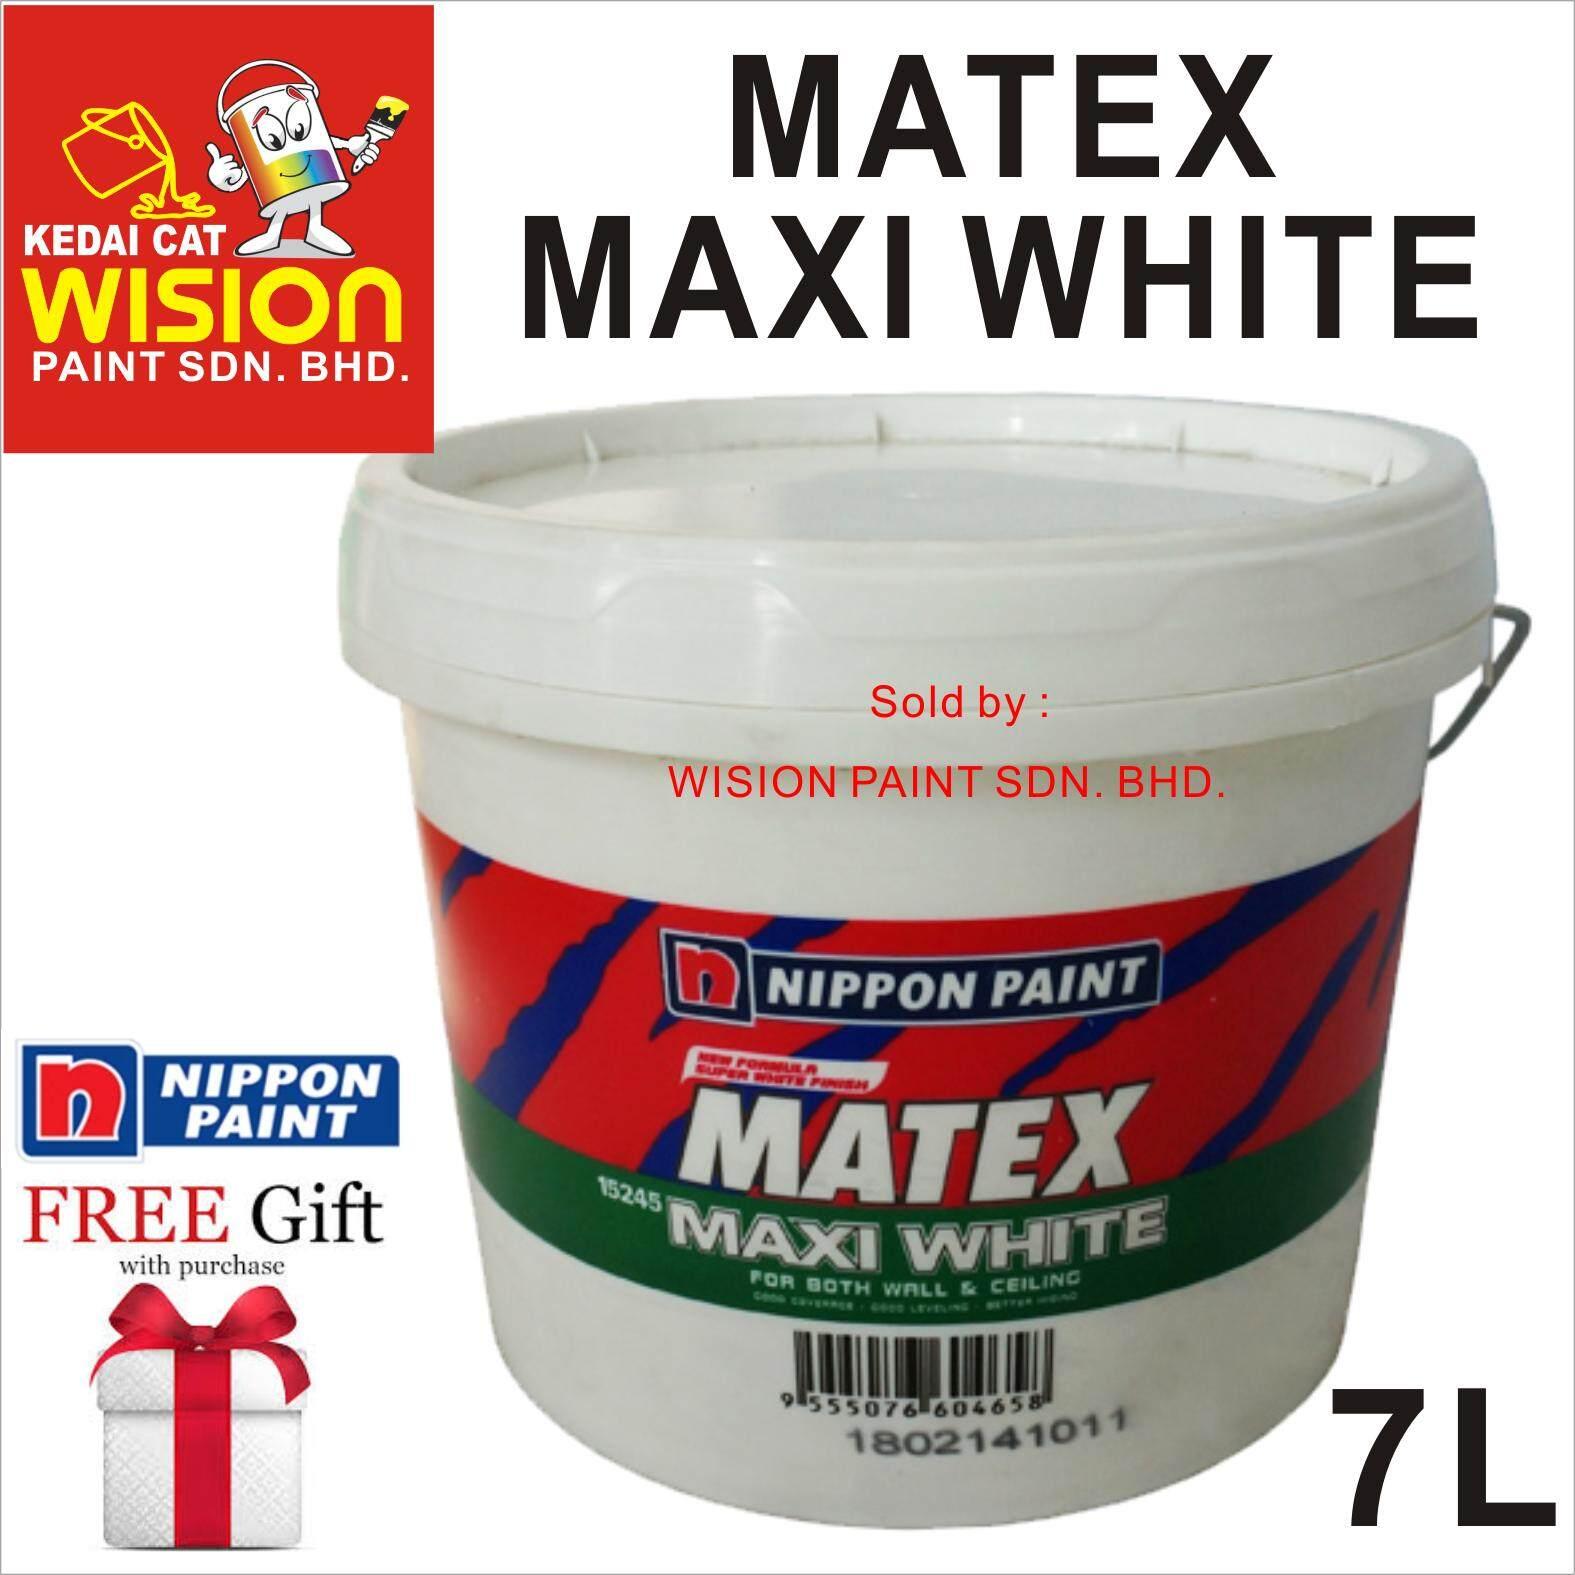 12245 MAXI WHITE (7L) NIPPON SUPER MATEX EMULSION PAINT ALIRAN DAN RATAAN YANG BAIK KUASA PENUTUP YANG CEMERLANG CAT PUTIH